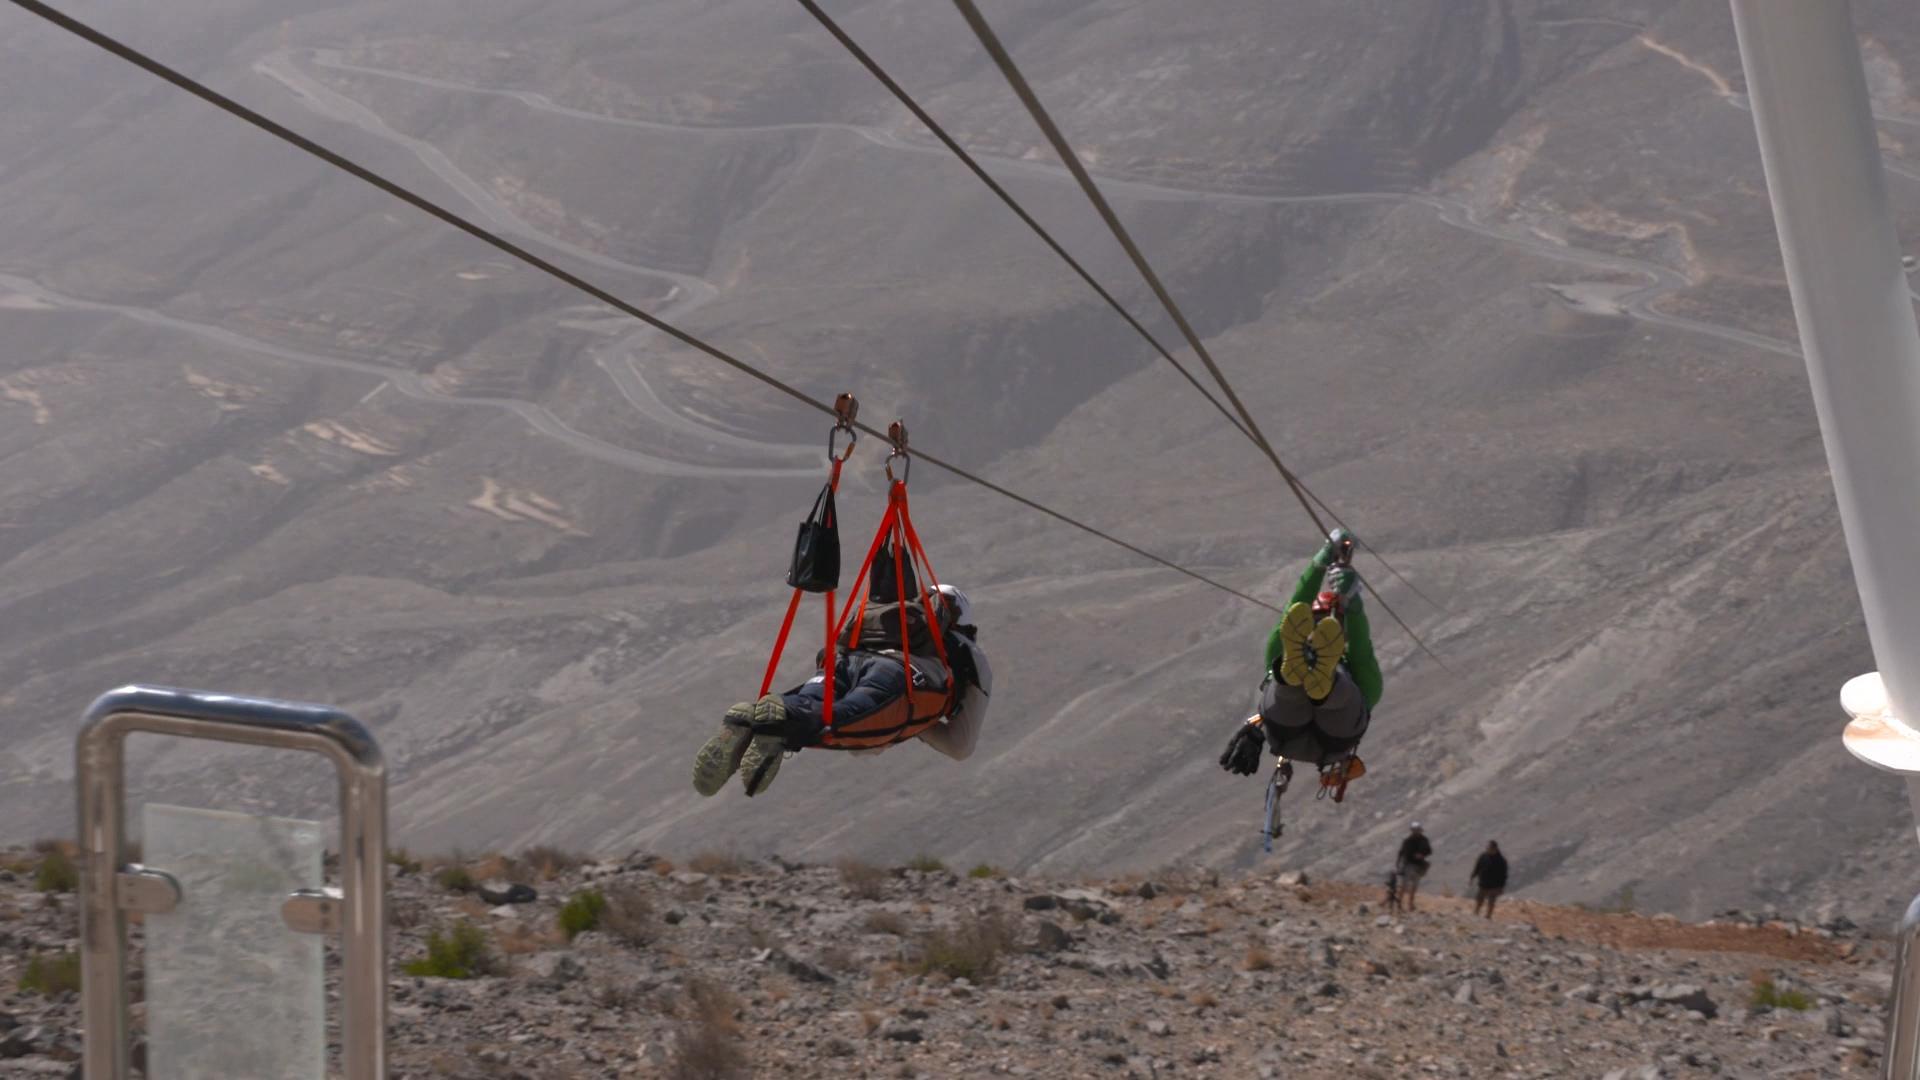 World\'s longest zip line coming to Ras Al Khaimah, UAE | CNN Travel